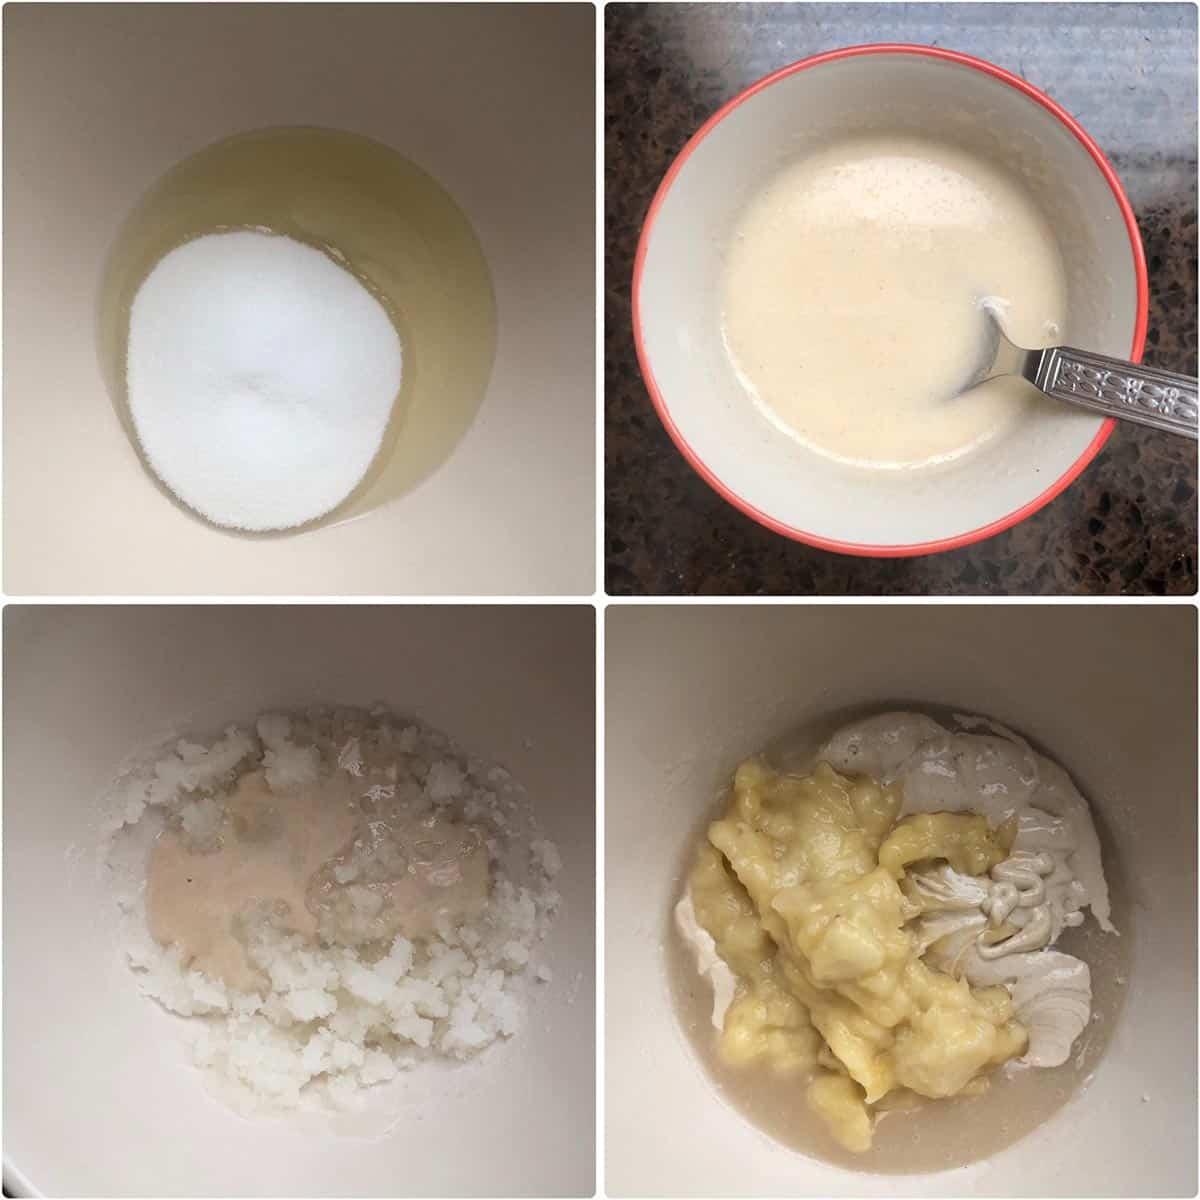 Combining oil, sugar, egg replacer, mashed banana to mixing bowl